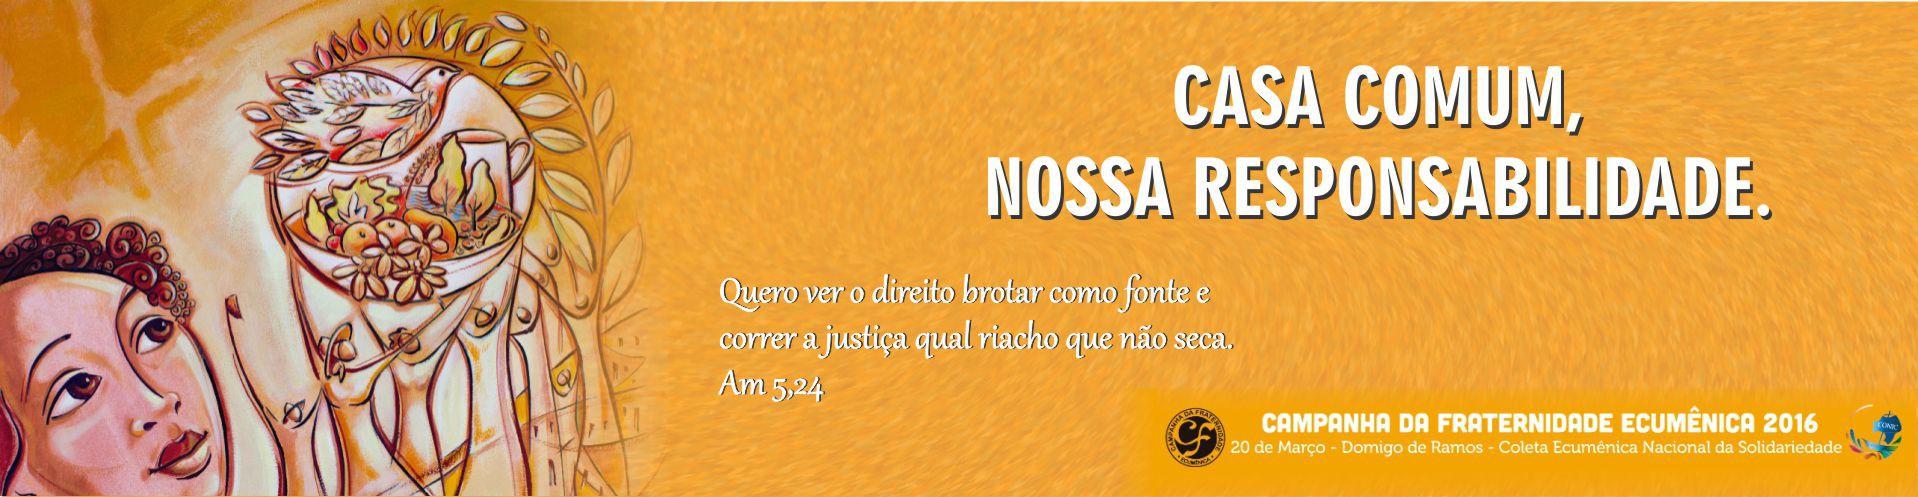 Banner_CampanhaFraternidade_SL